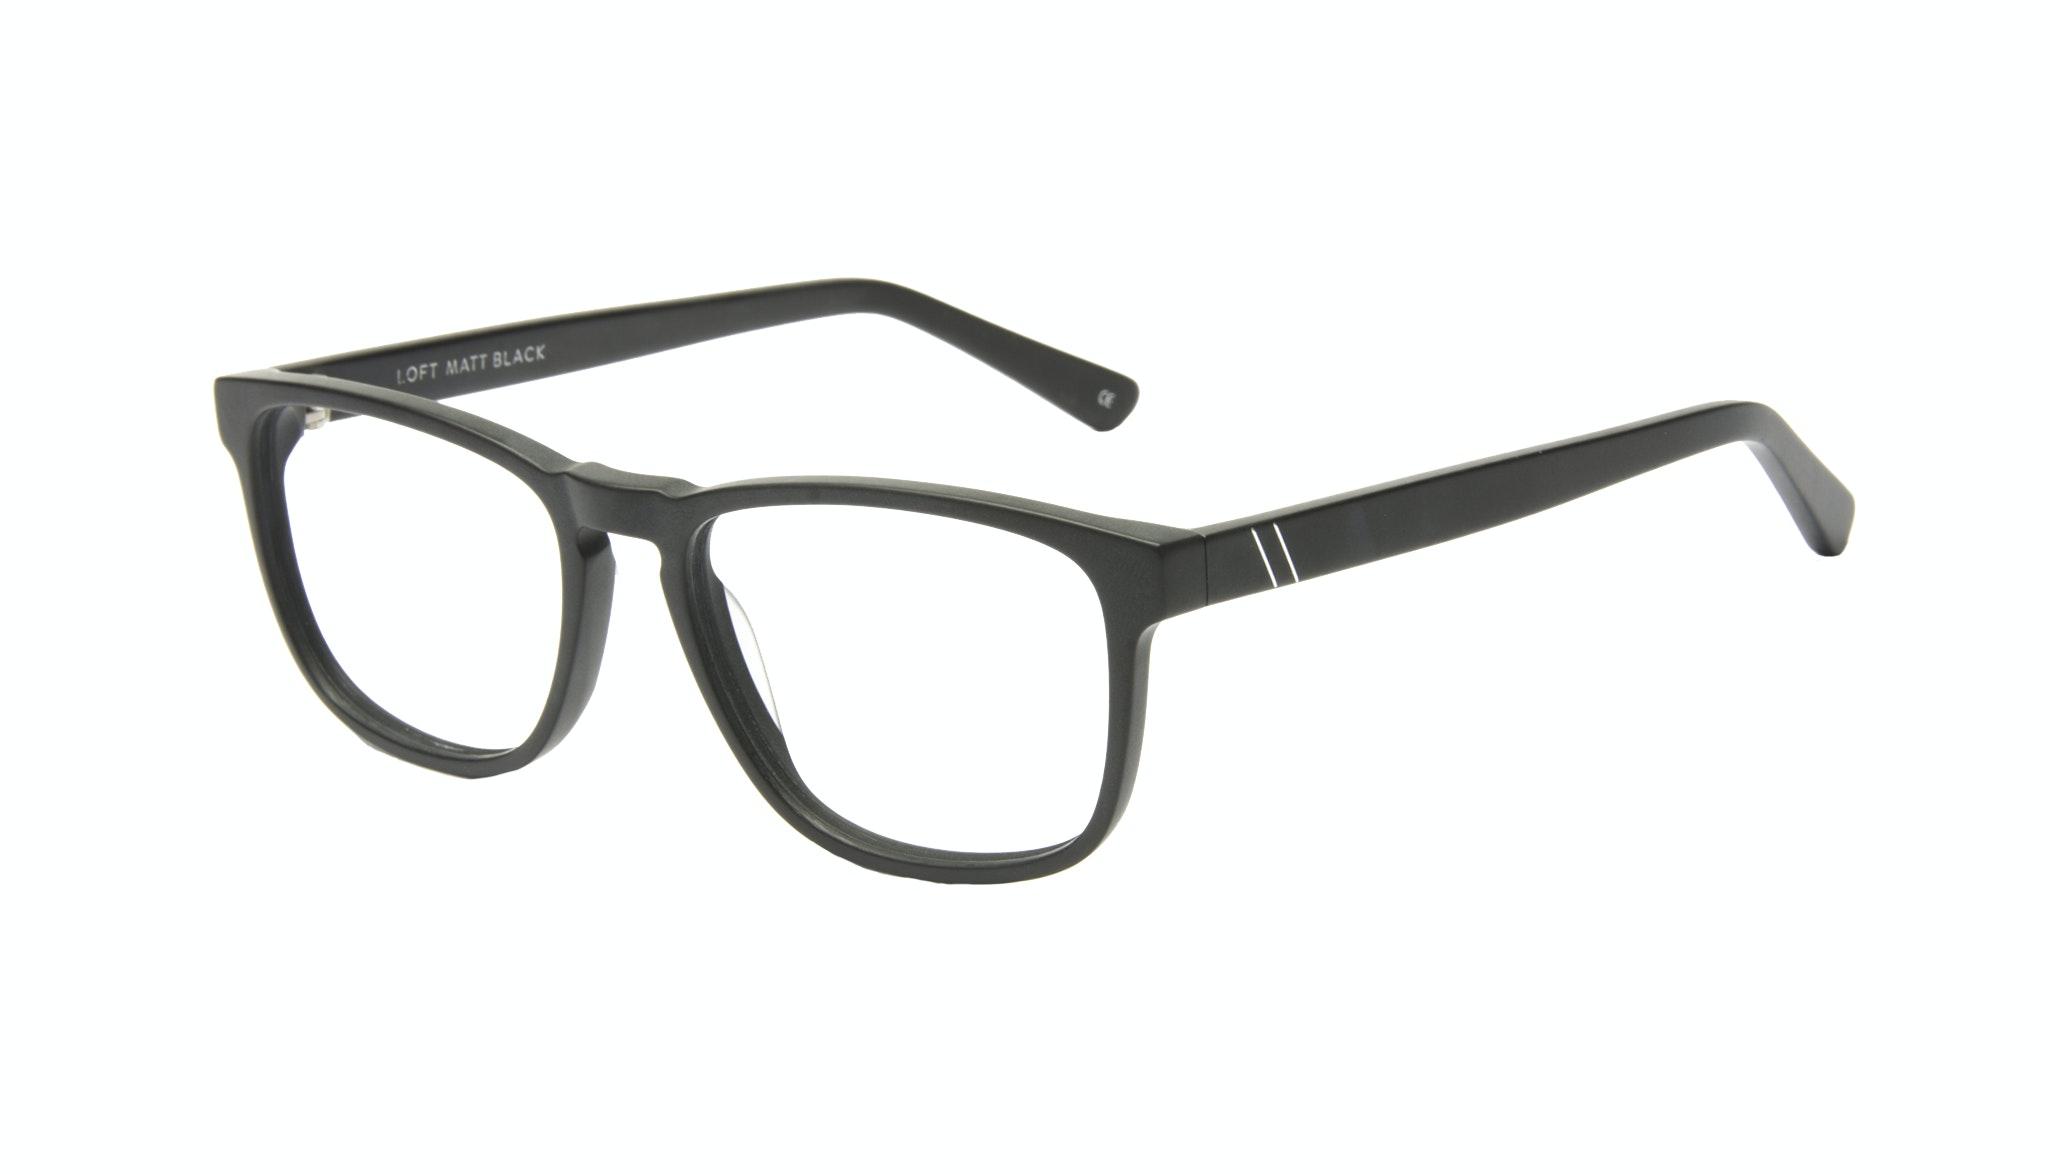 Affordable Fashion Glasses Rectangle Eyeglasses Men Loft Black Matte Tilt